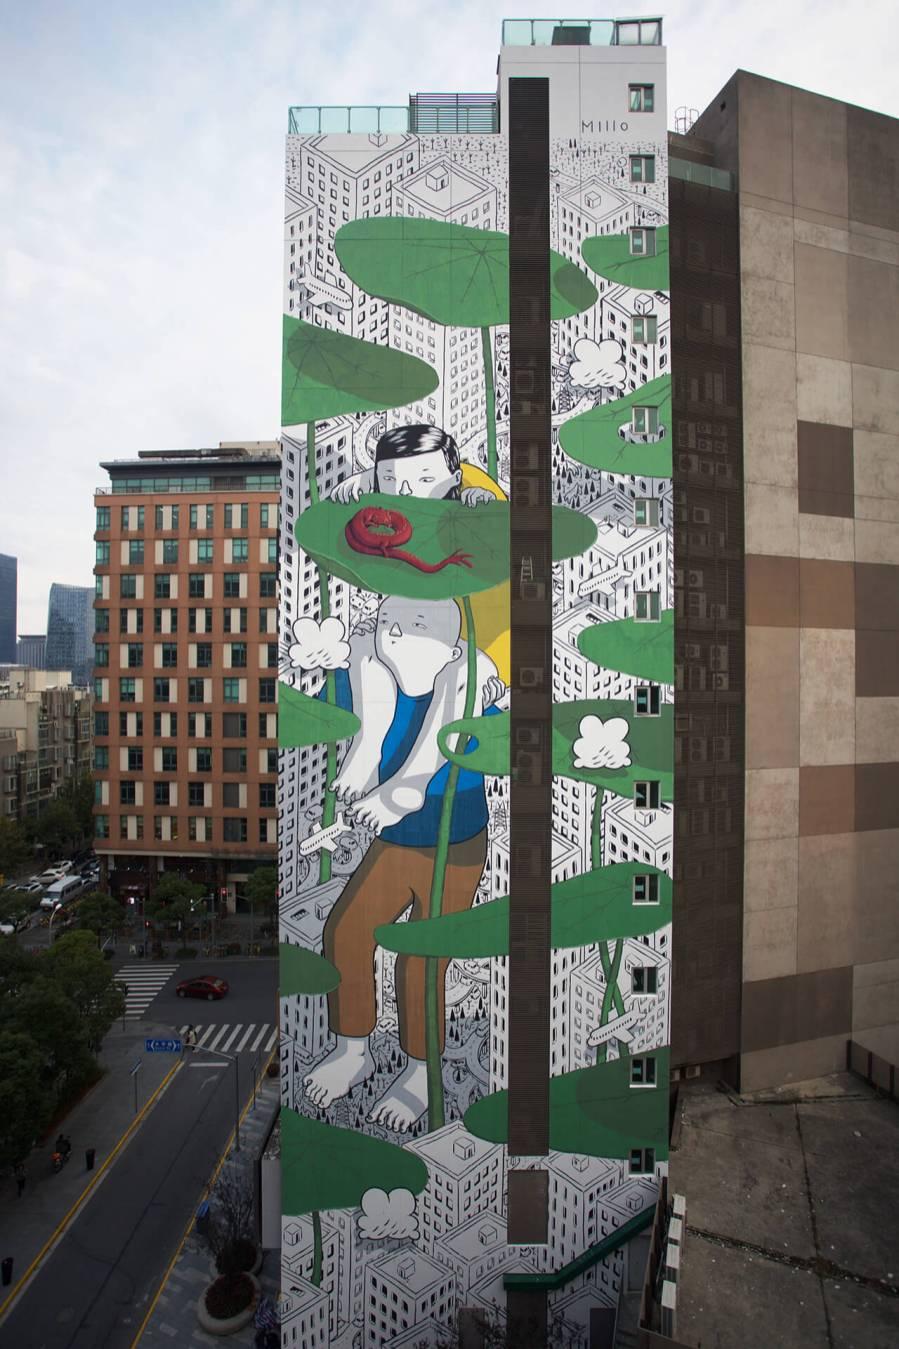 "Millo, Street art Mural "" Twist of Fate"" Shanghai, China 2017. Photo Credit Millo"